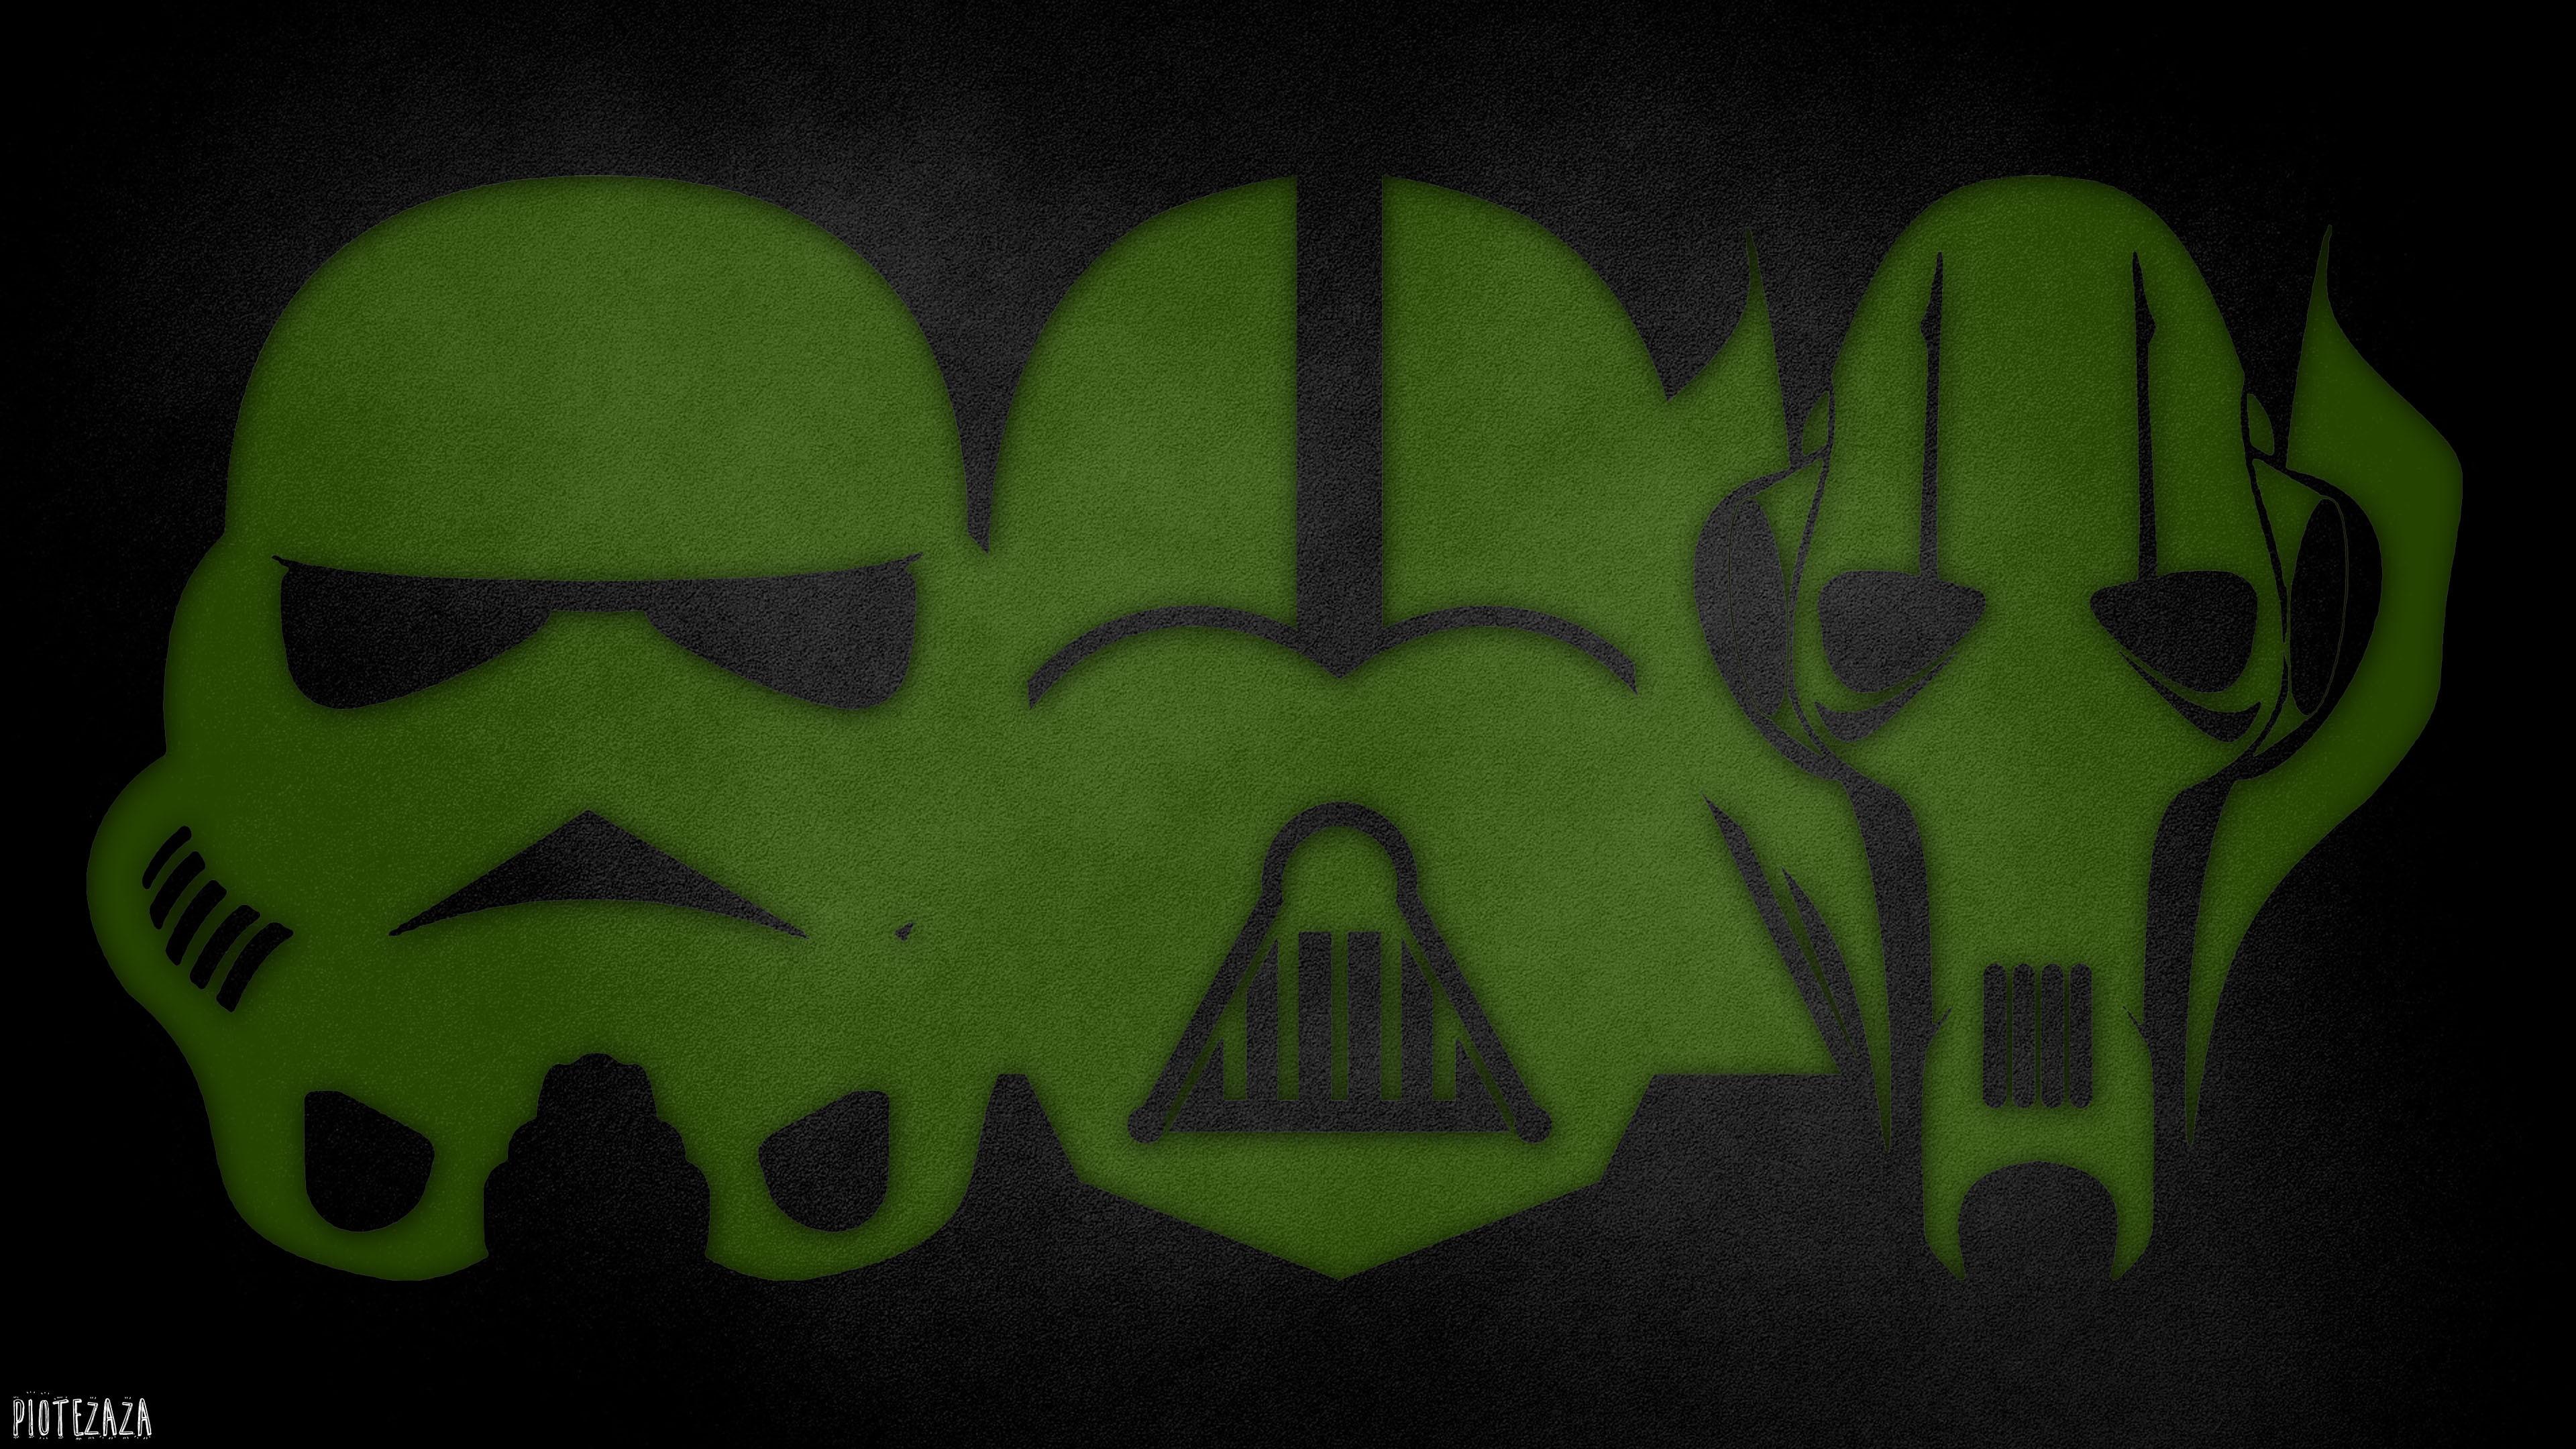 General 3840x2160 Star Wars green helmet stormtrooper